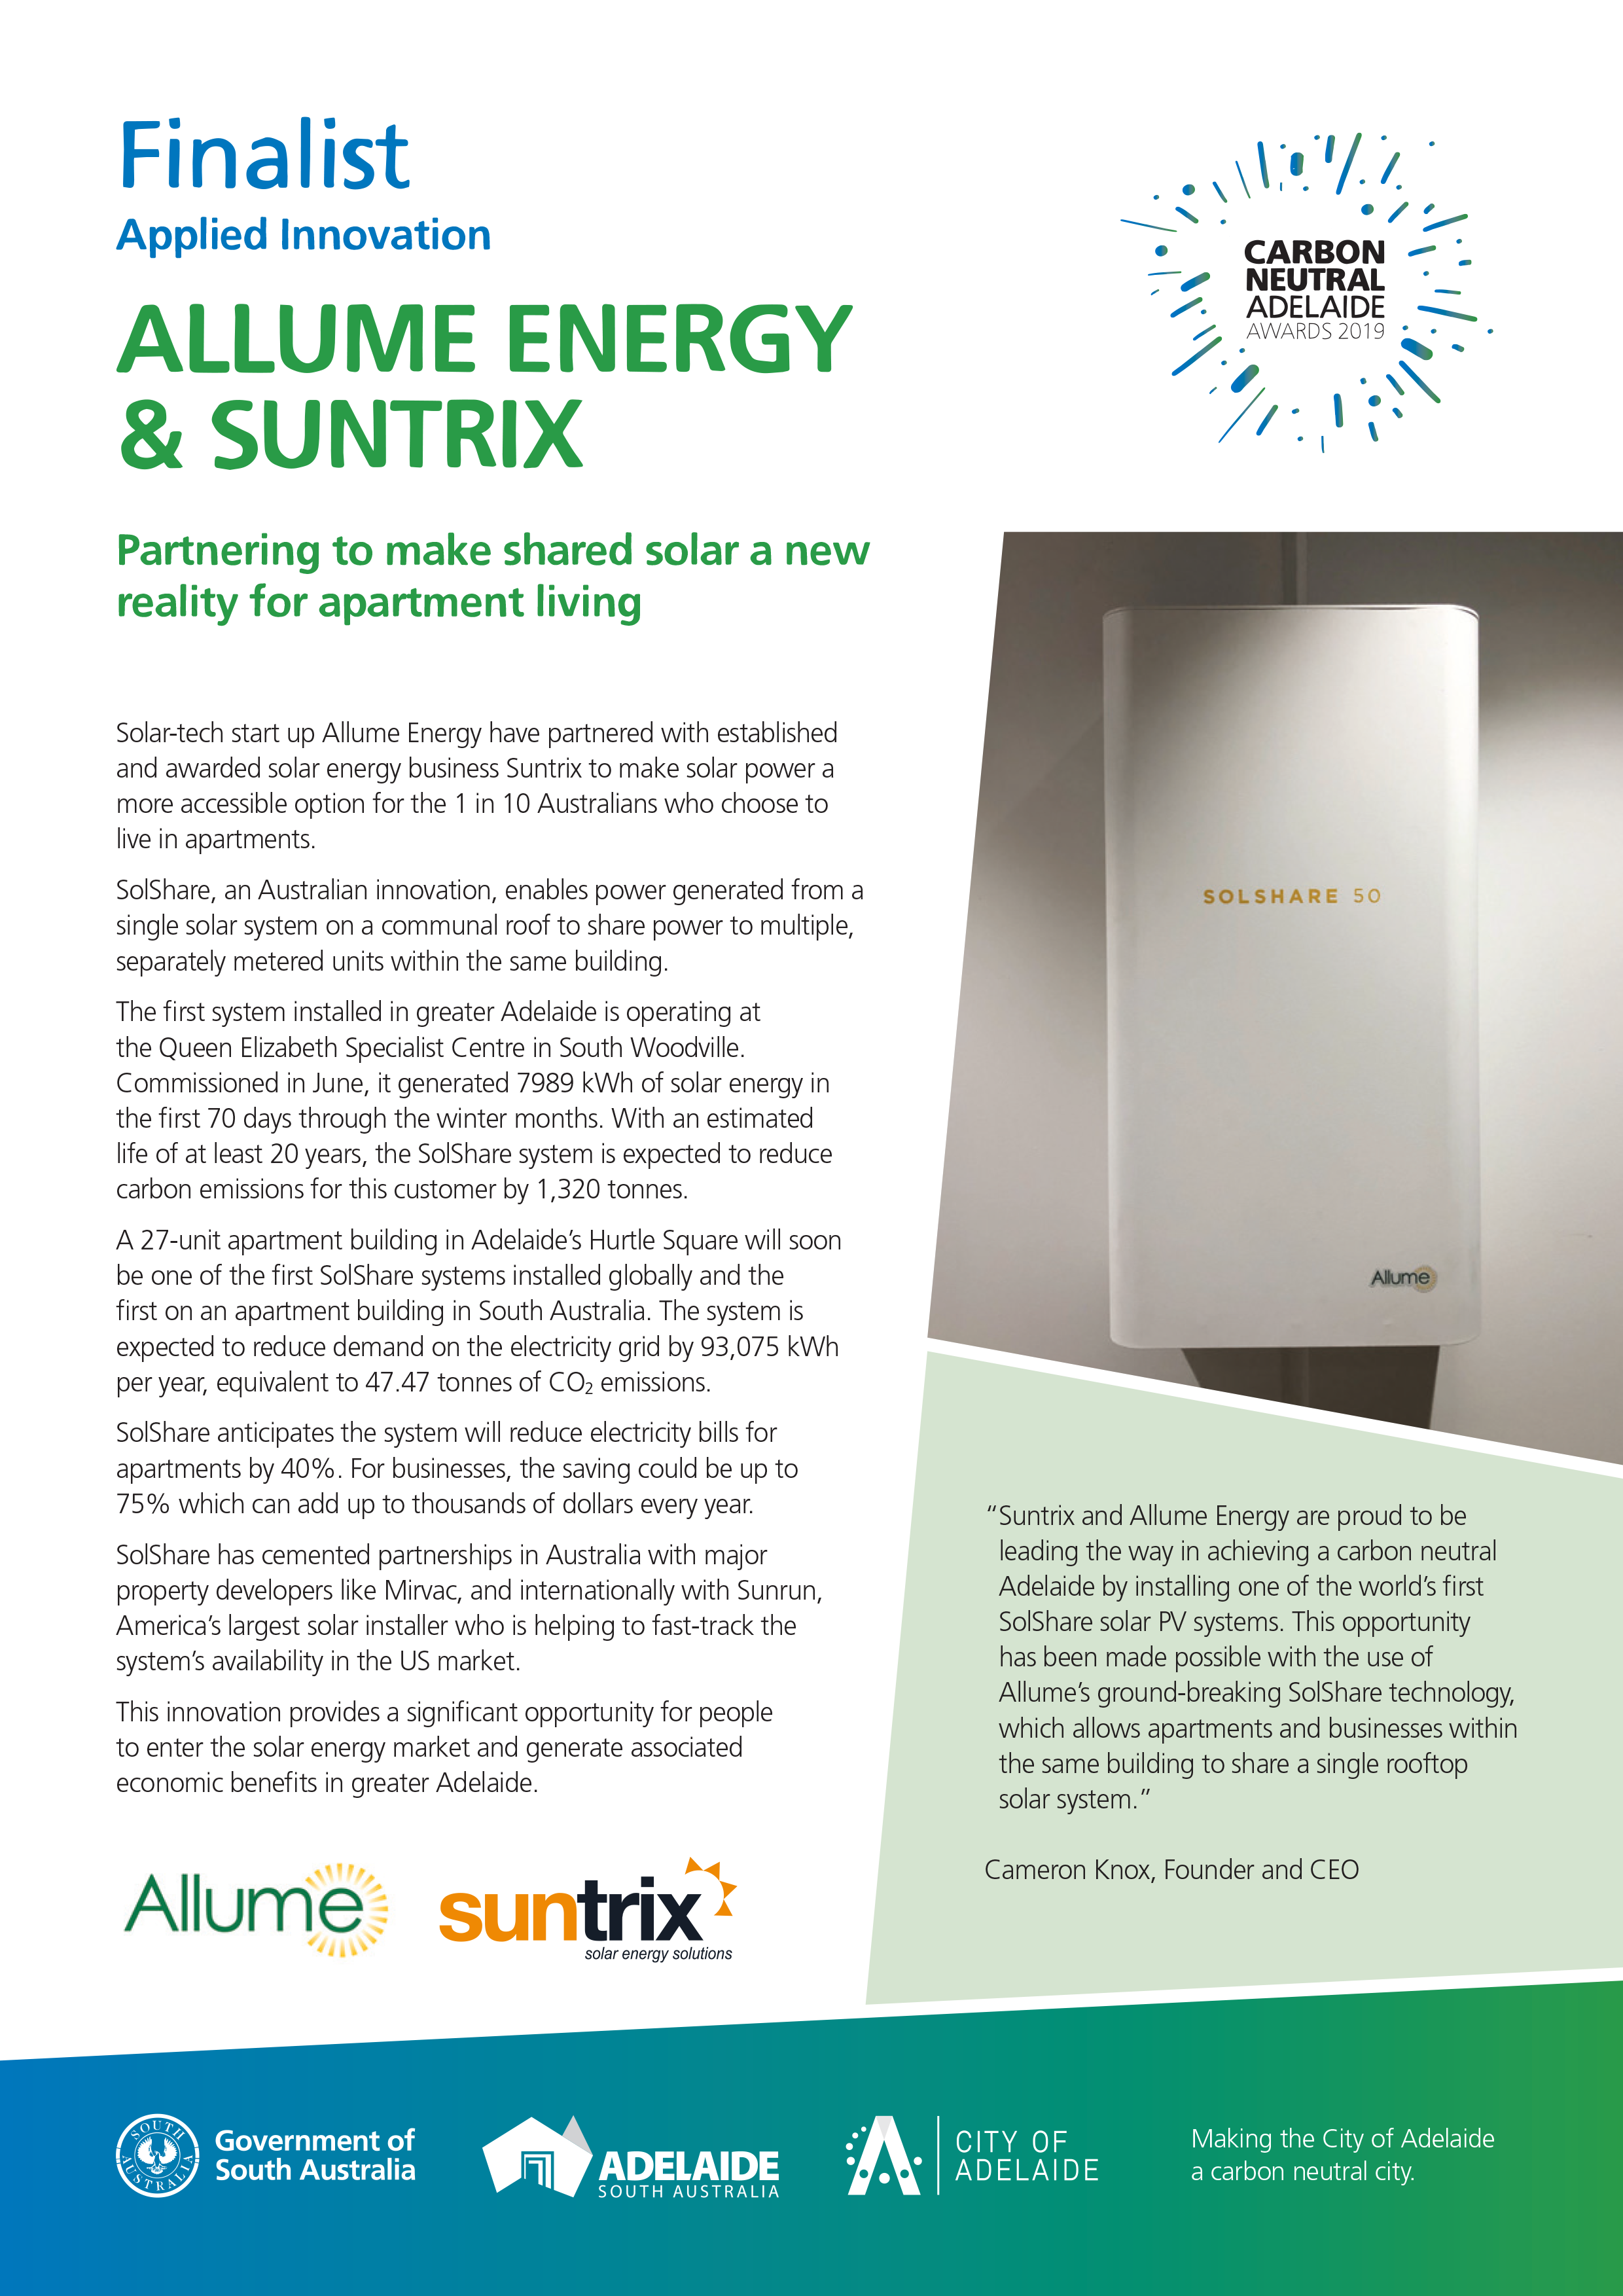 Allume Energy & Suntrix - Finalist